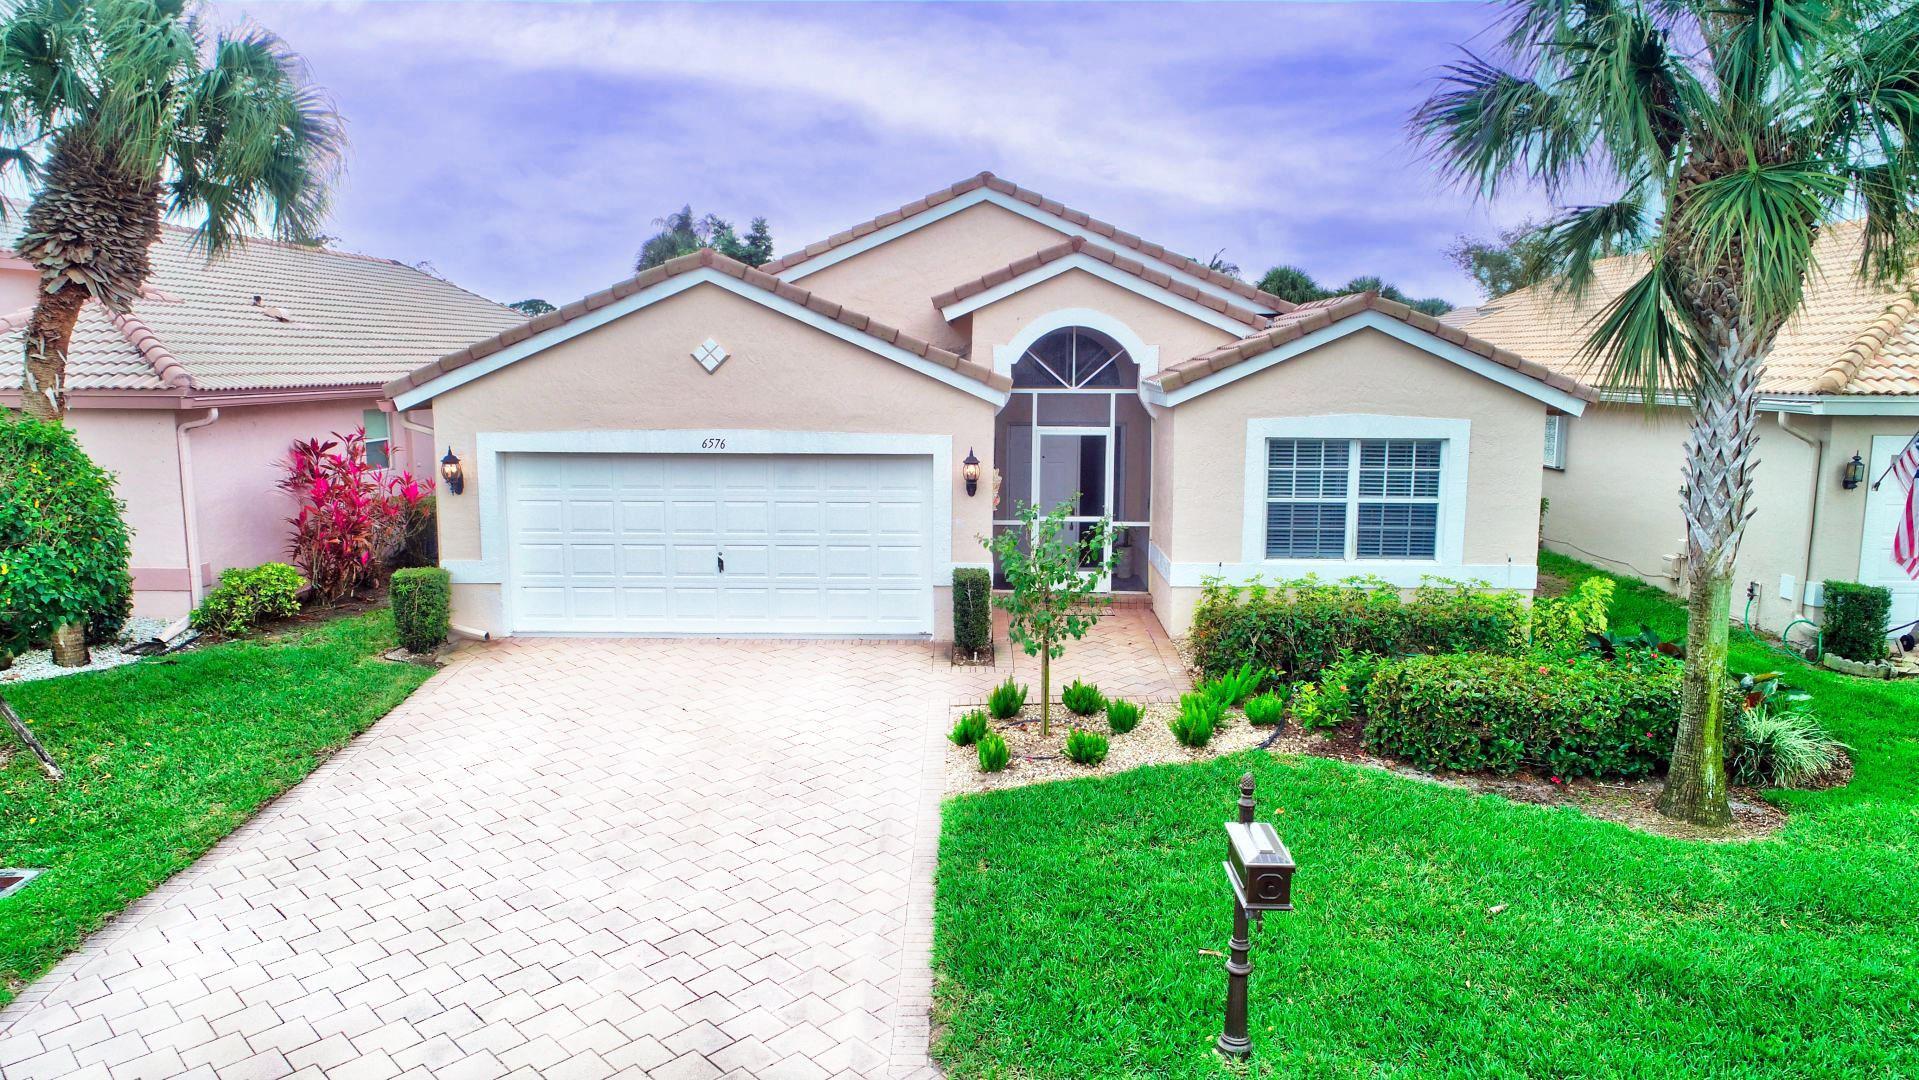 6576 Bayhill Terrace, Boynton Beach, FL 33437 - #: RX-10693007